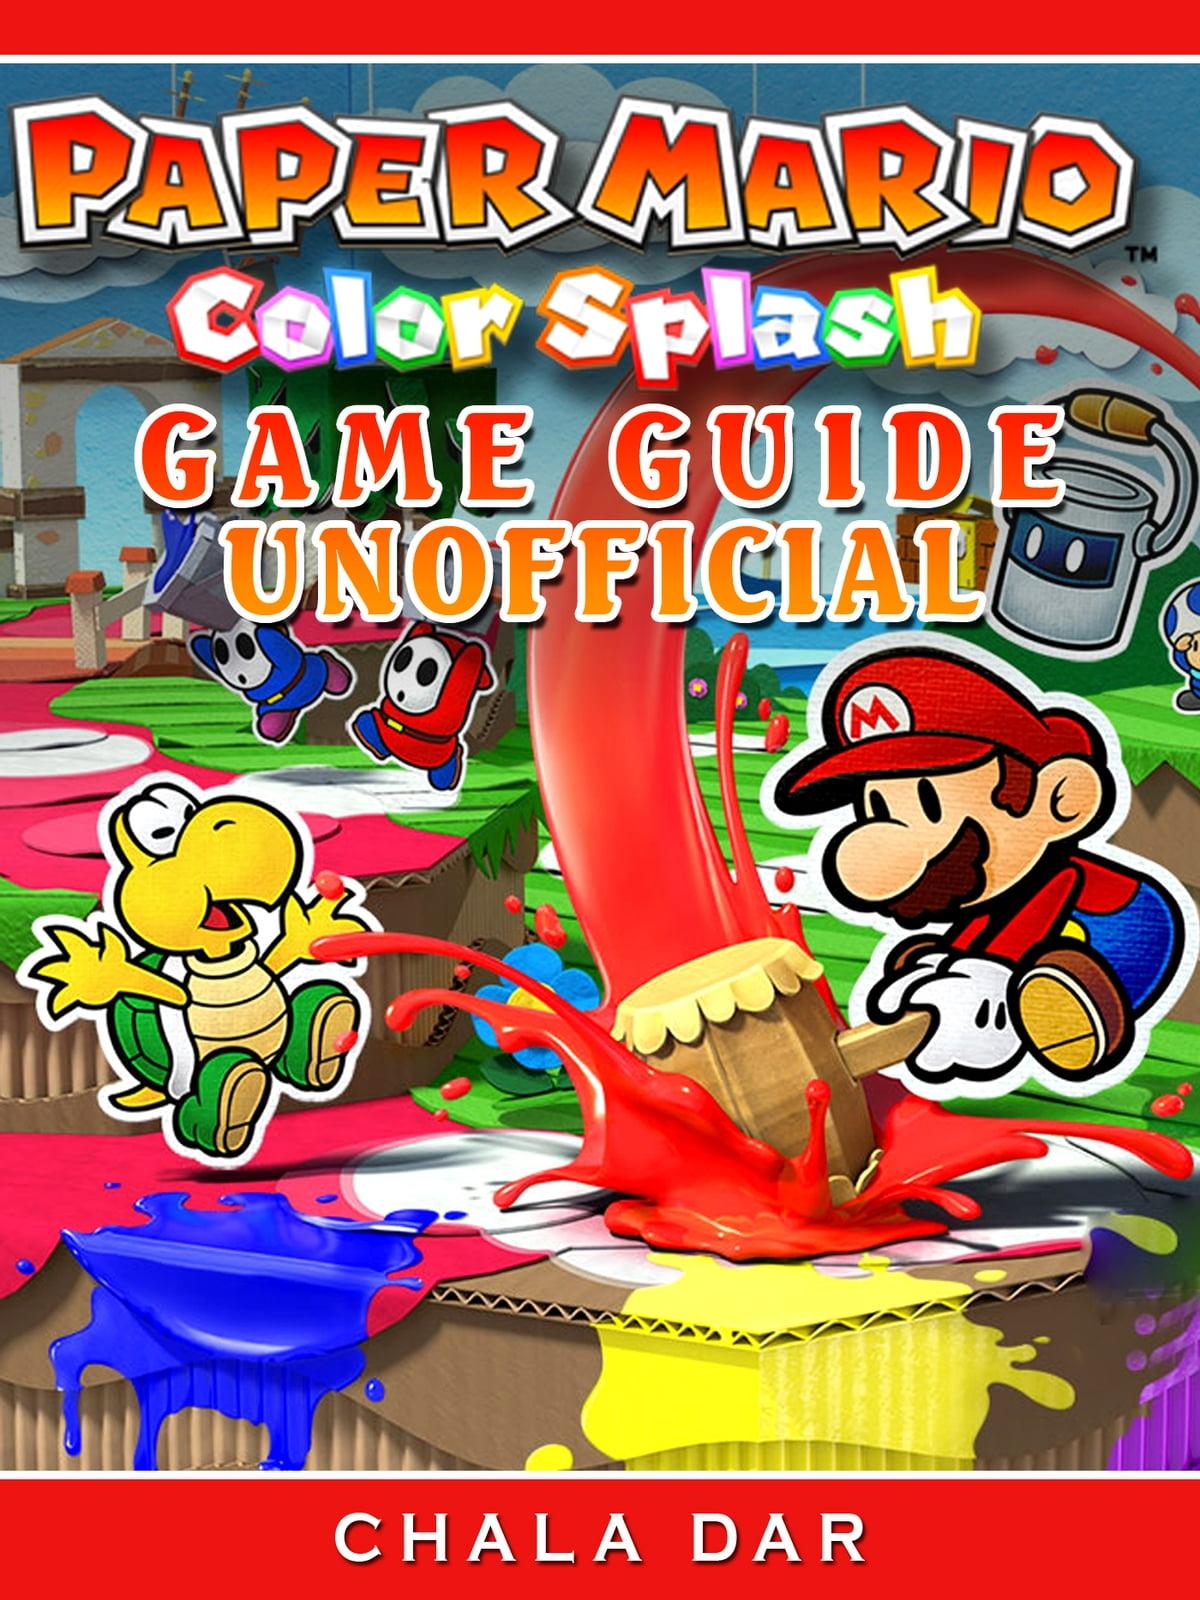 Paper Mario Color Splash Map : paper, mario, color, splash, Paper, Mario, Color, Splash, Guide, Unofficial, EBook, Chala, 9781387255733, Rakuten, United, States